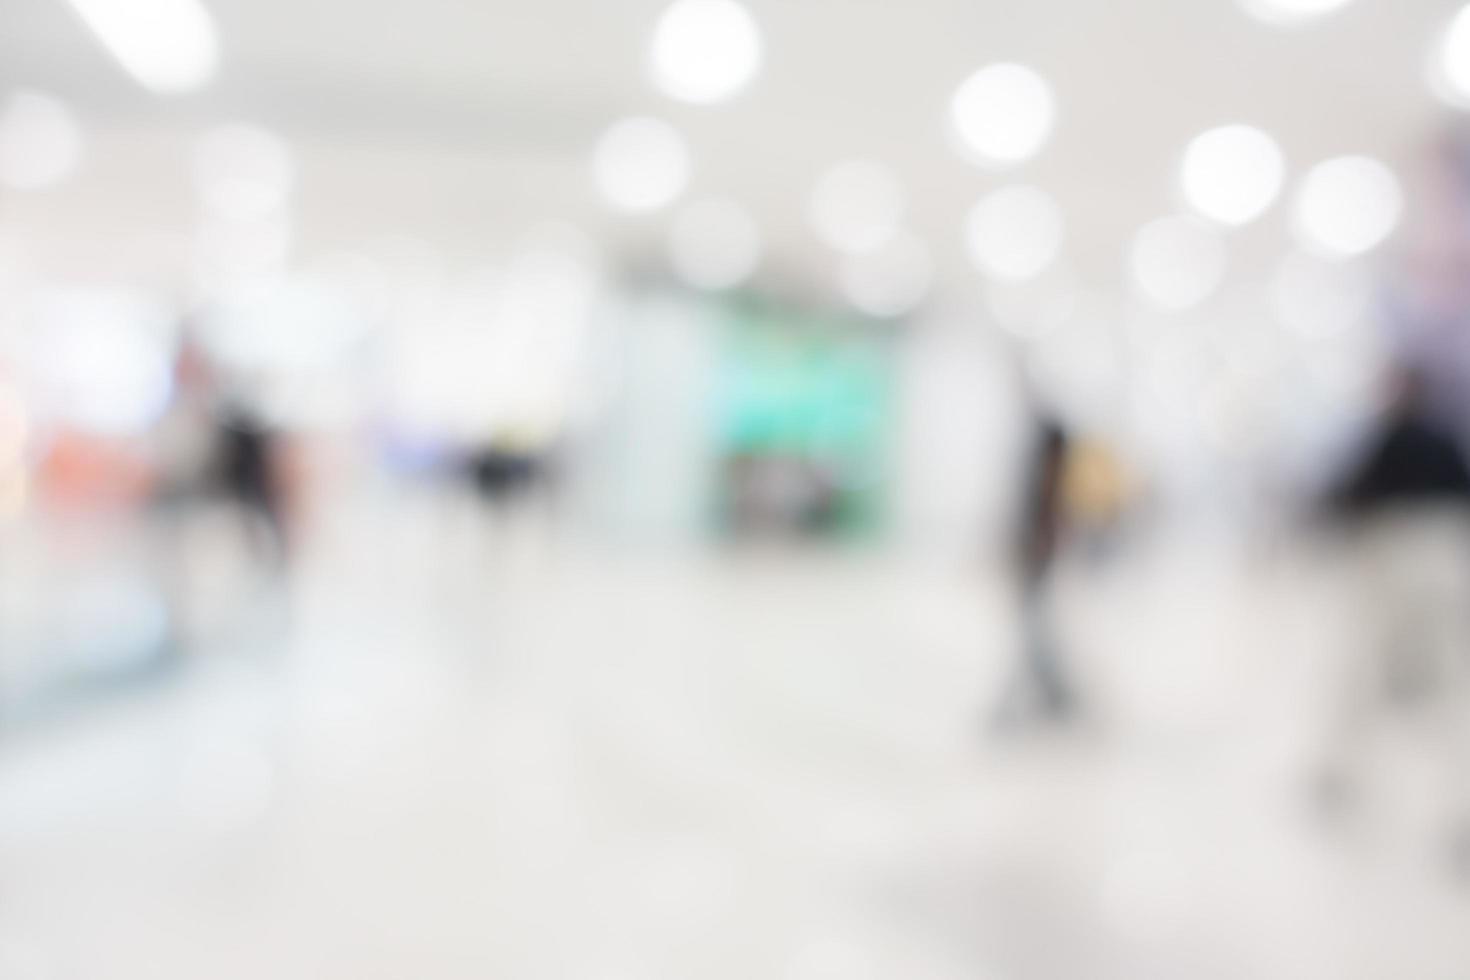 centro comercial borroso abstracto foto